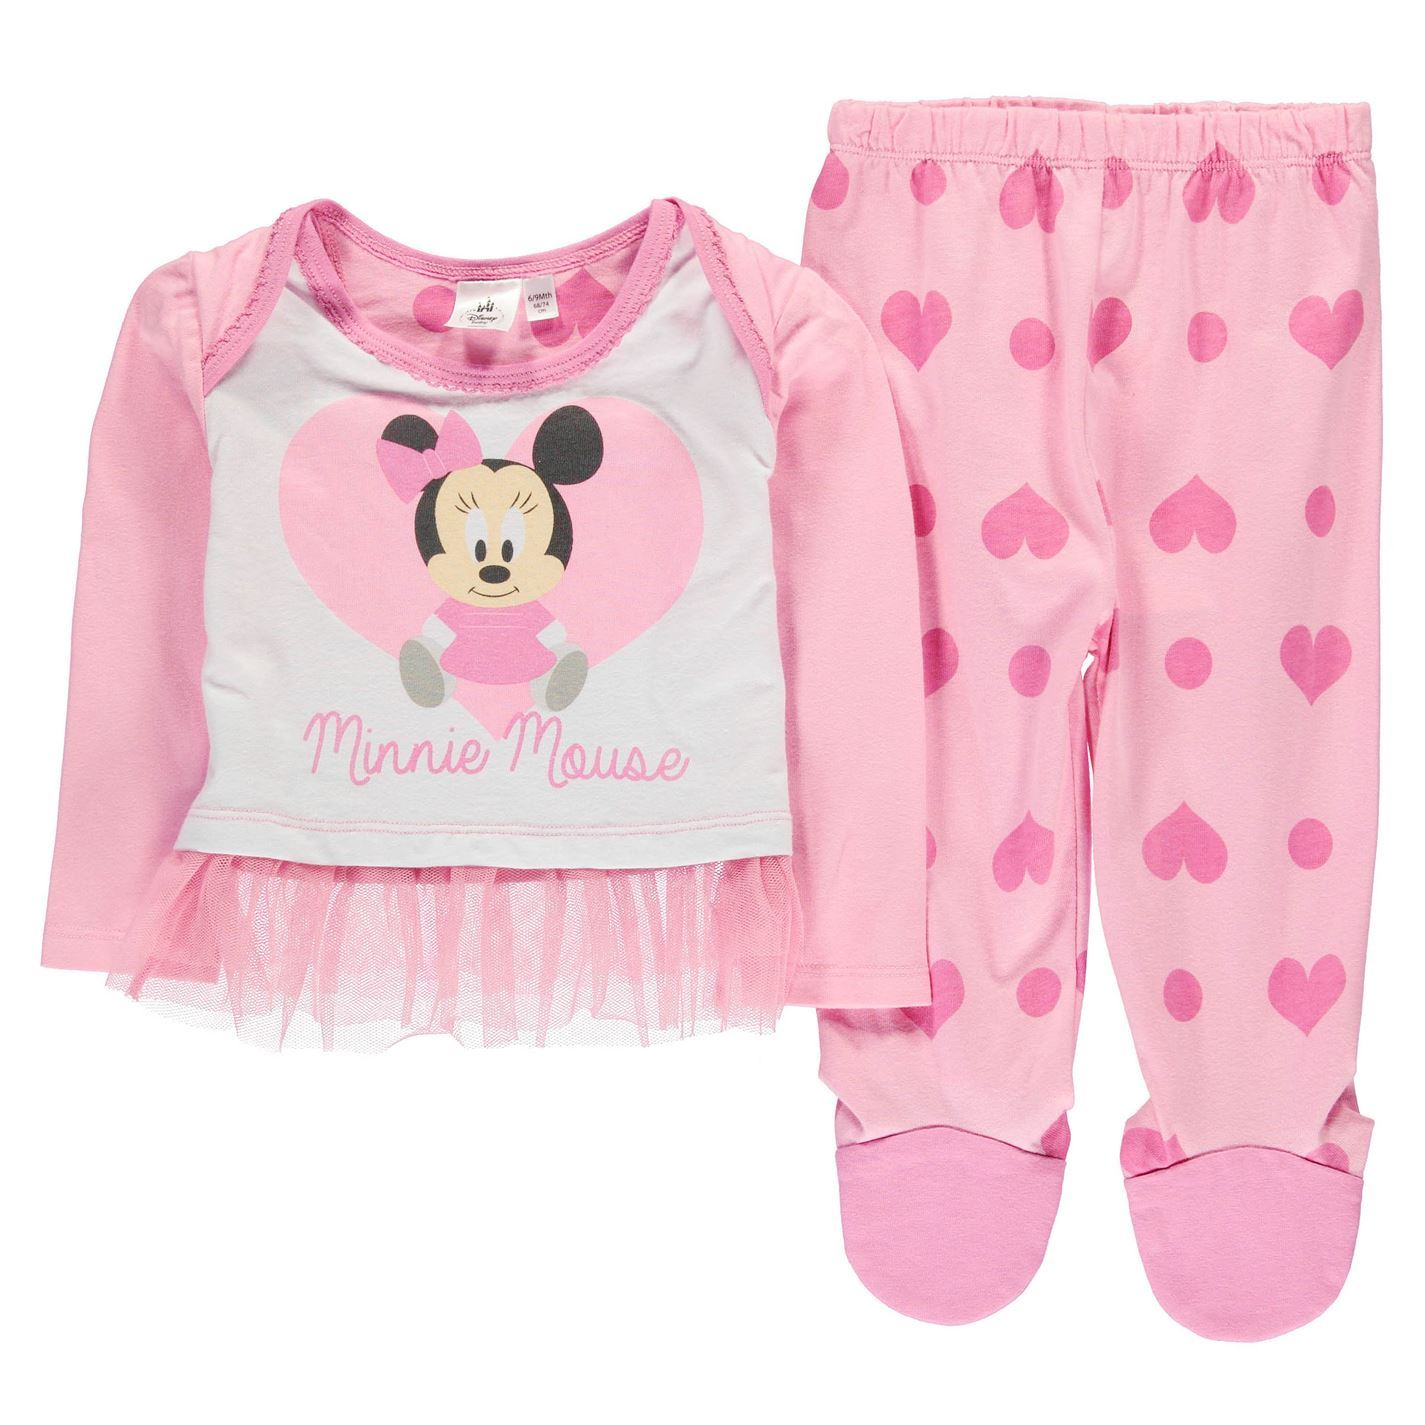 Disney Minnie Mouse 2 Piece Pyjama Set Infant Baby Pink Pajama